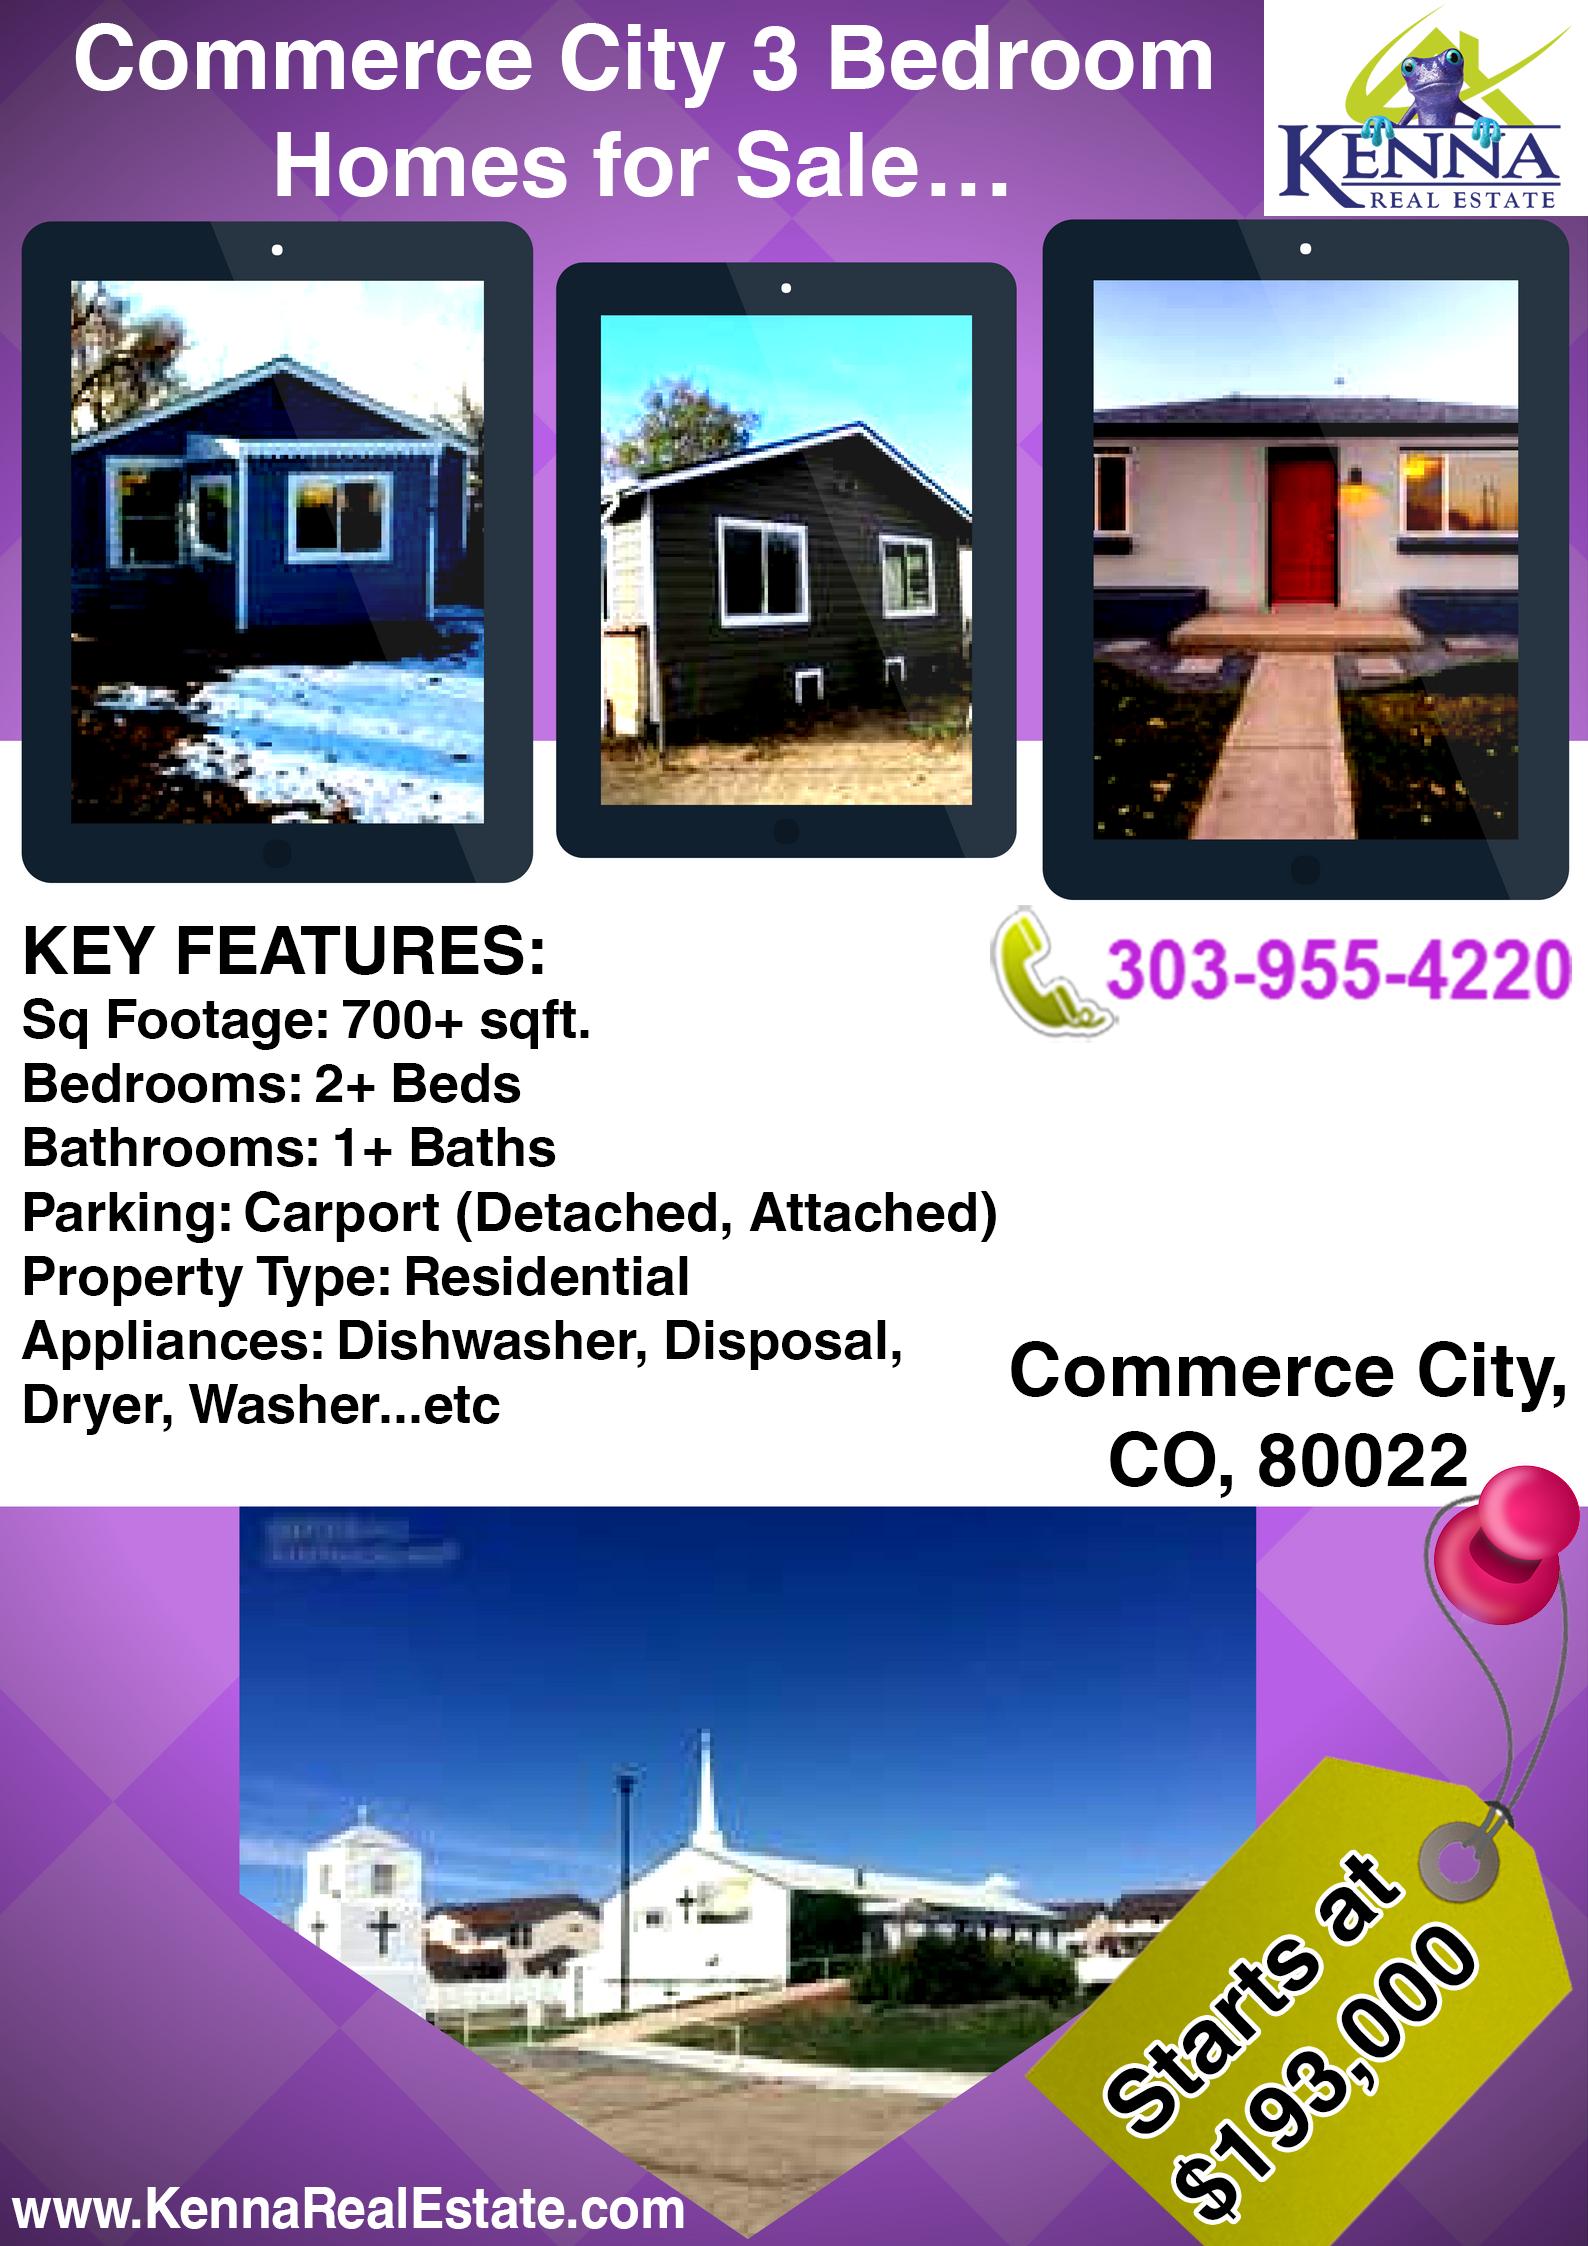 Heritage Property Management Richland Road Yuba City Ca